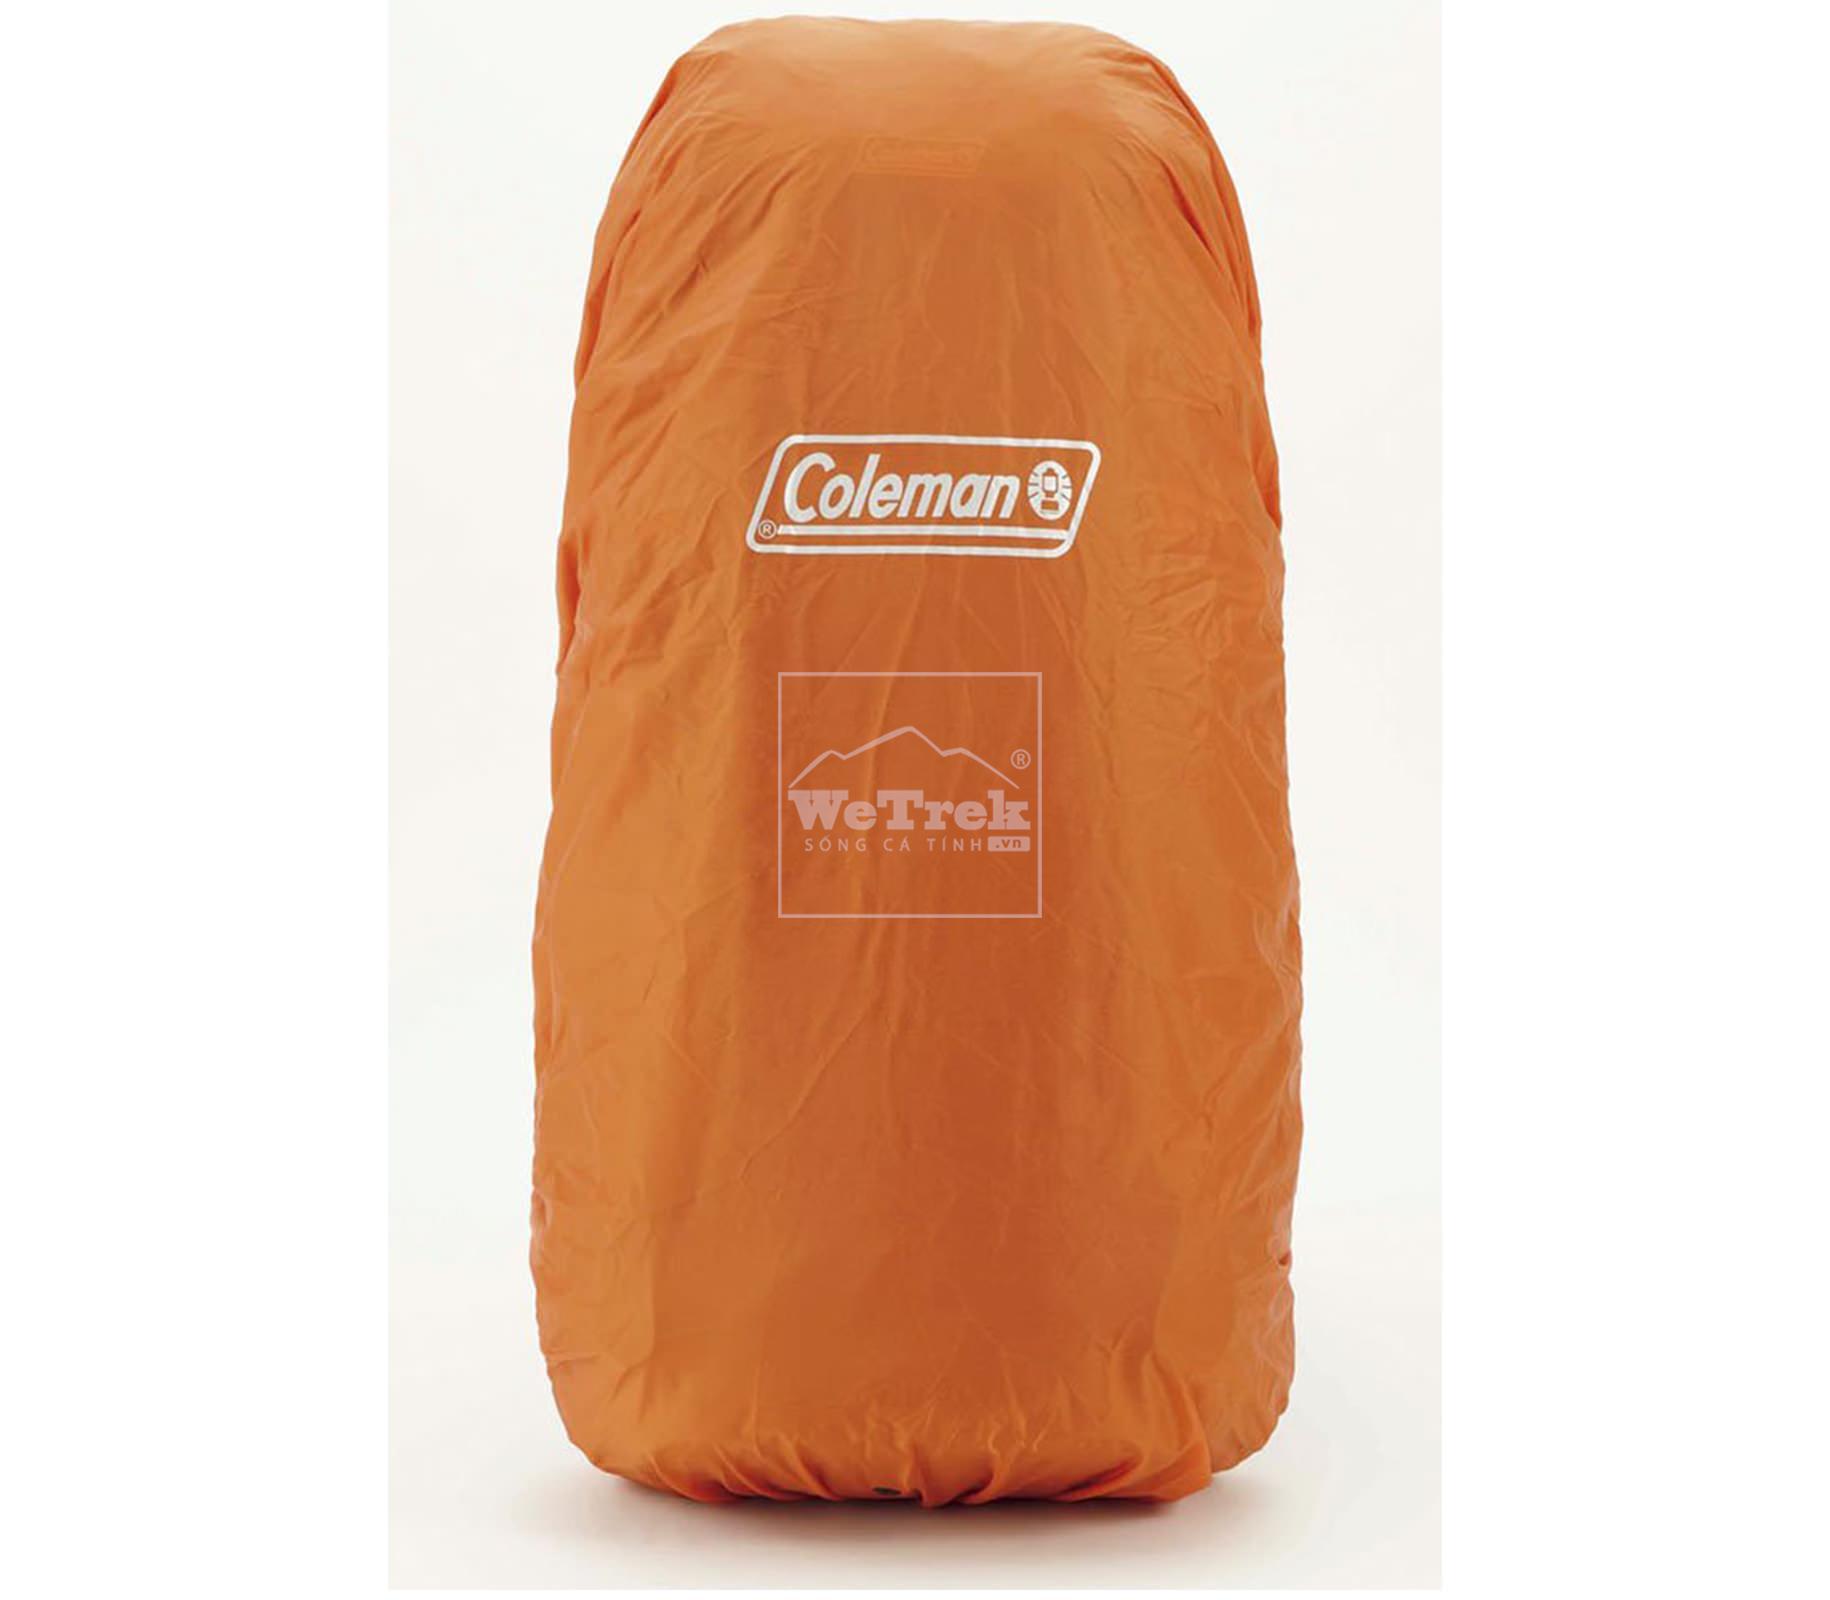 ba-lo-leo-nui-50l-coleman-mttrek-lite-backpack-black-cbb3491bk-7454-wetrek.vn-3